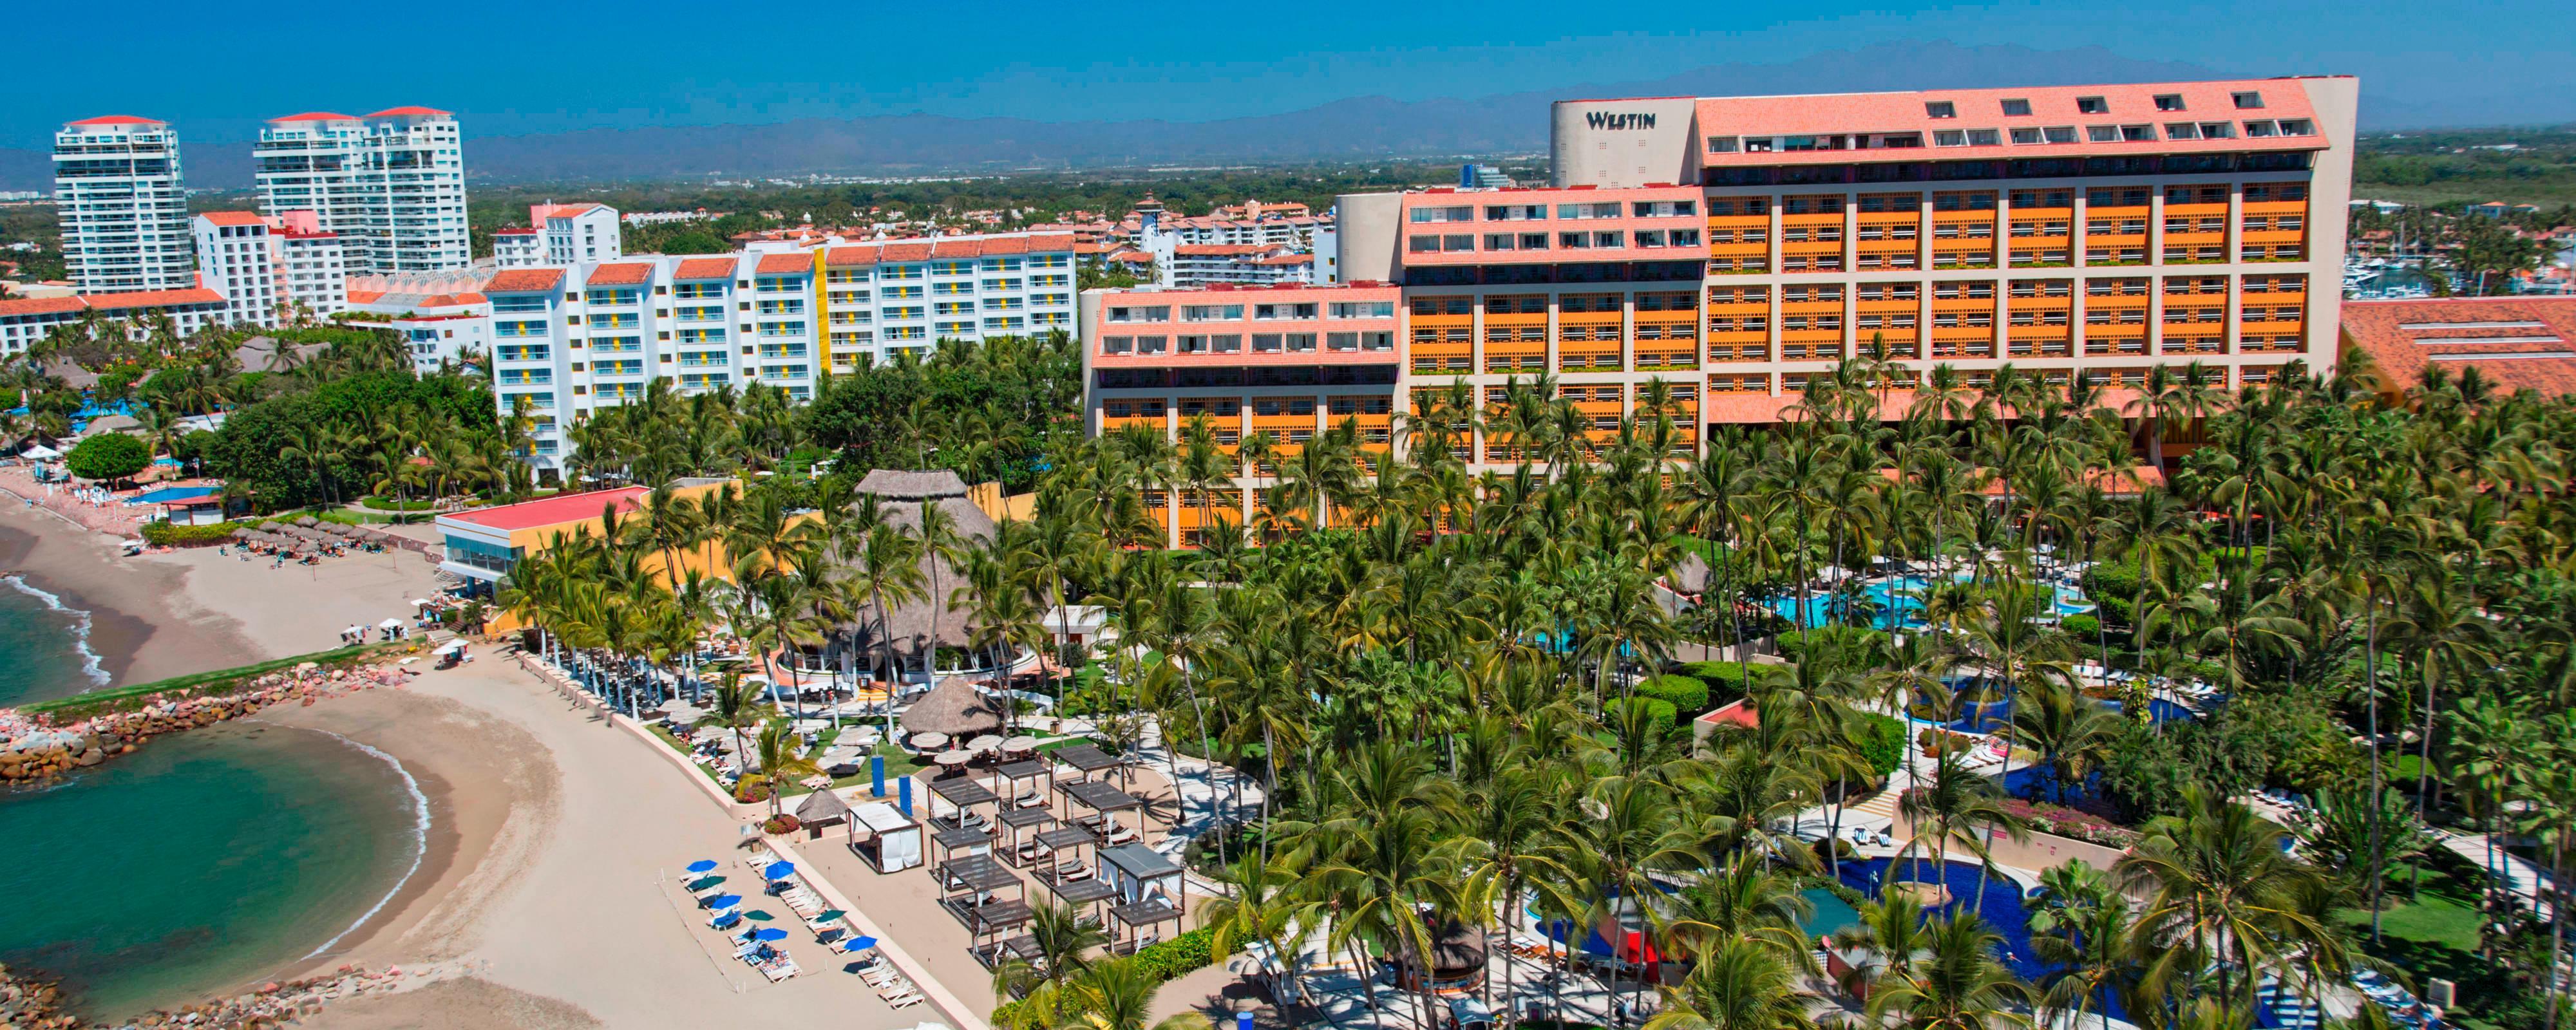 [Mexico] The Westin Resort & Spa, Puerto Vallarta 4-Night for 2 People for $299  (Travel thru October 2021)